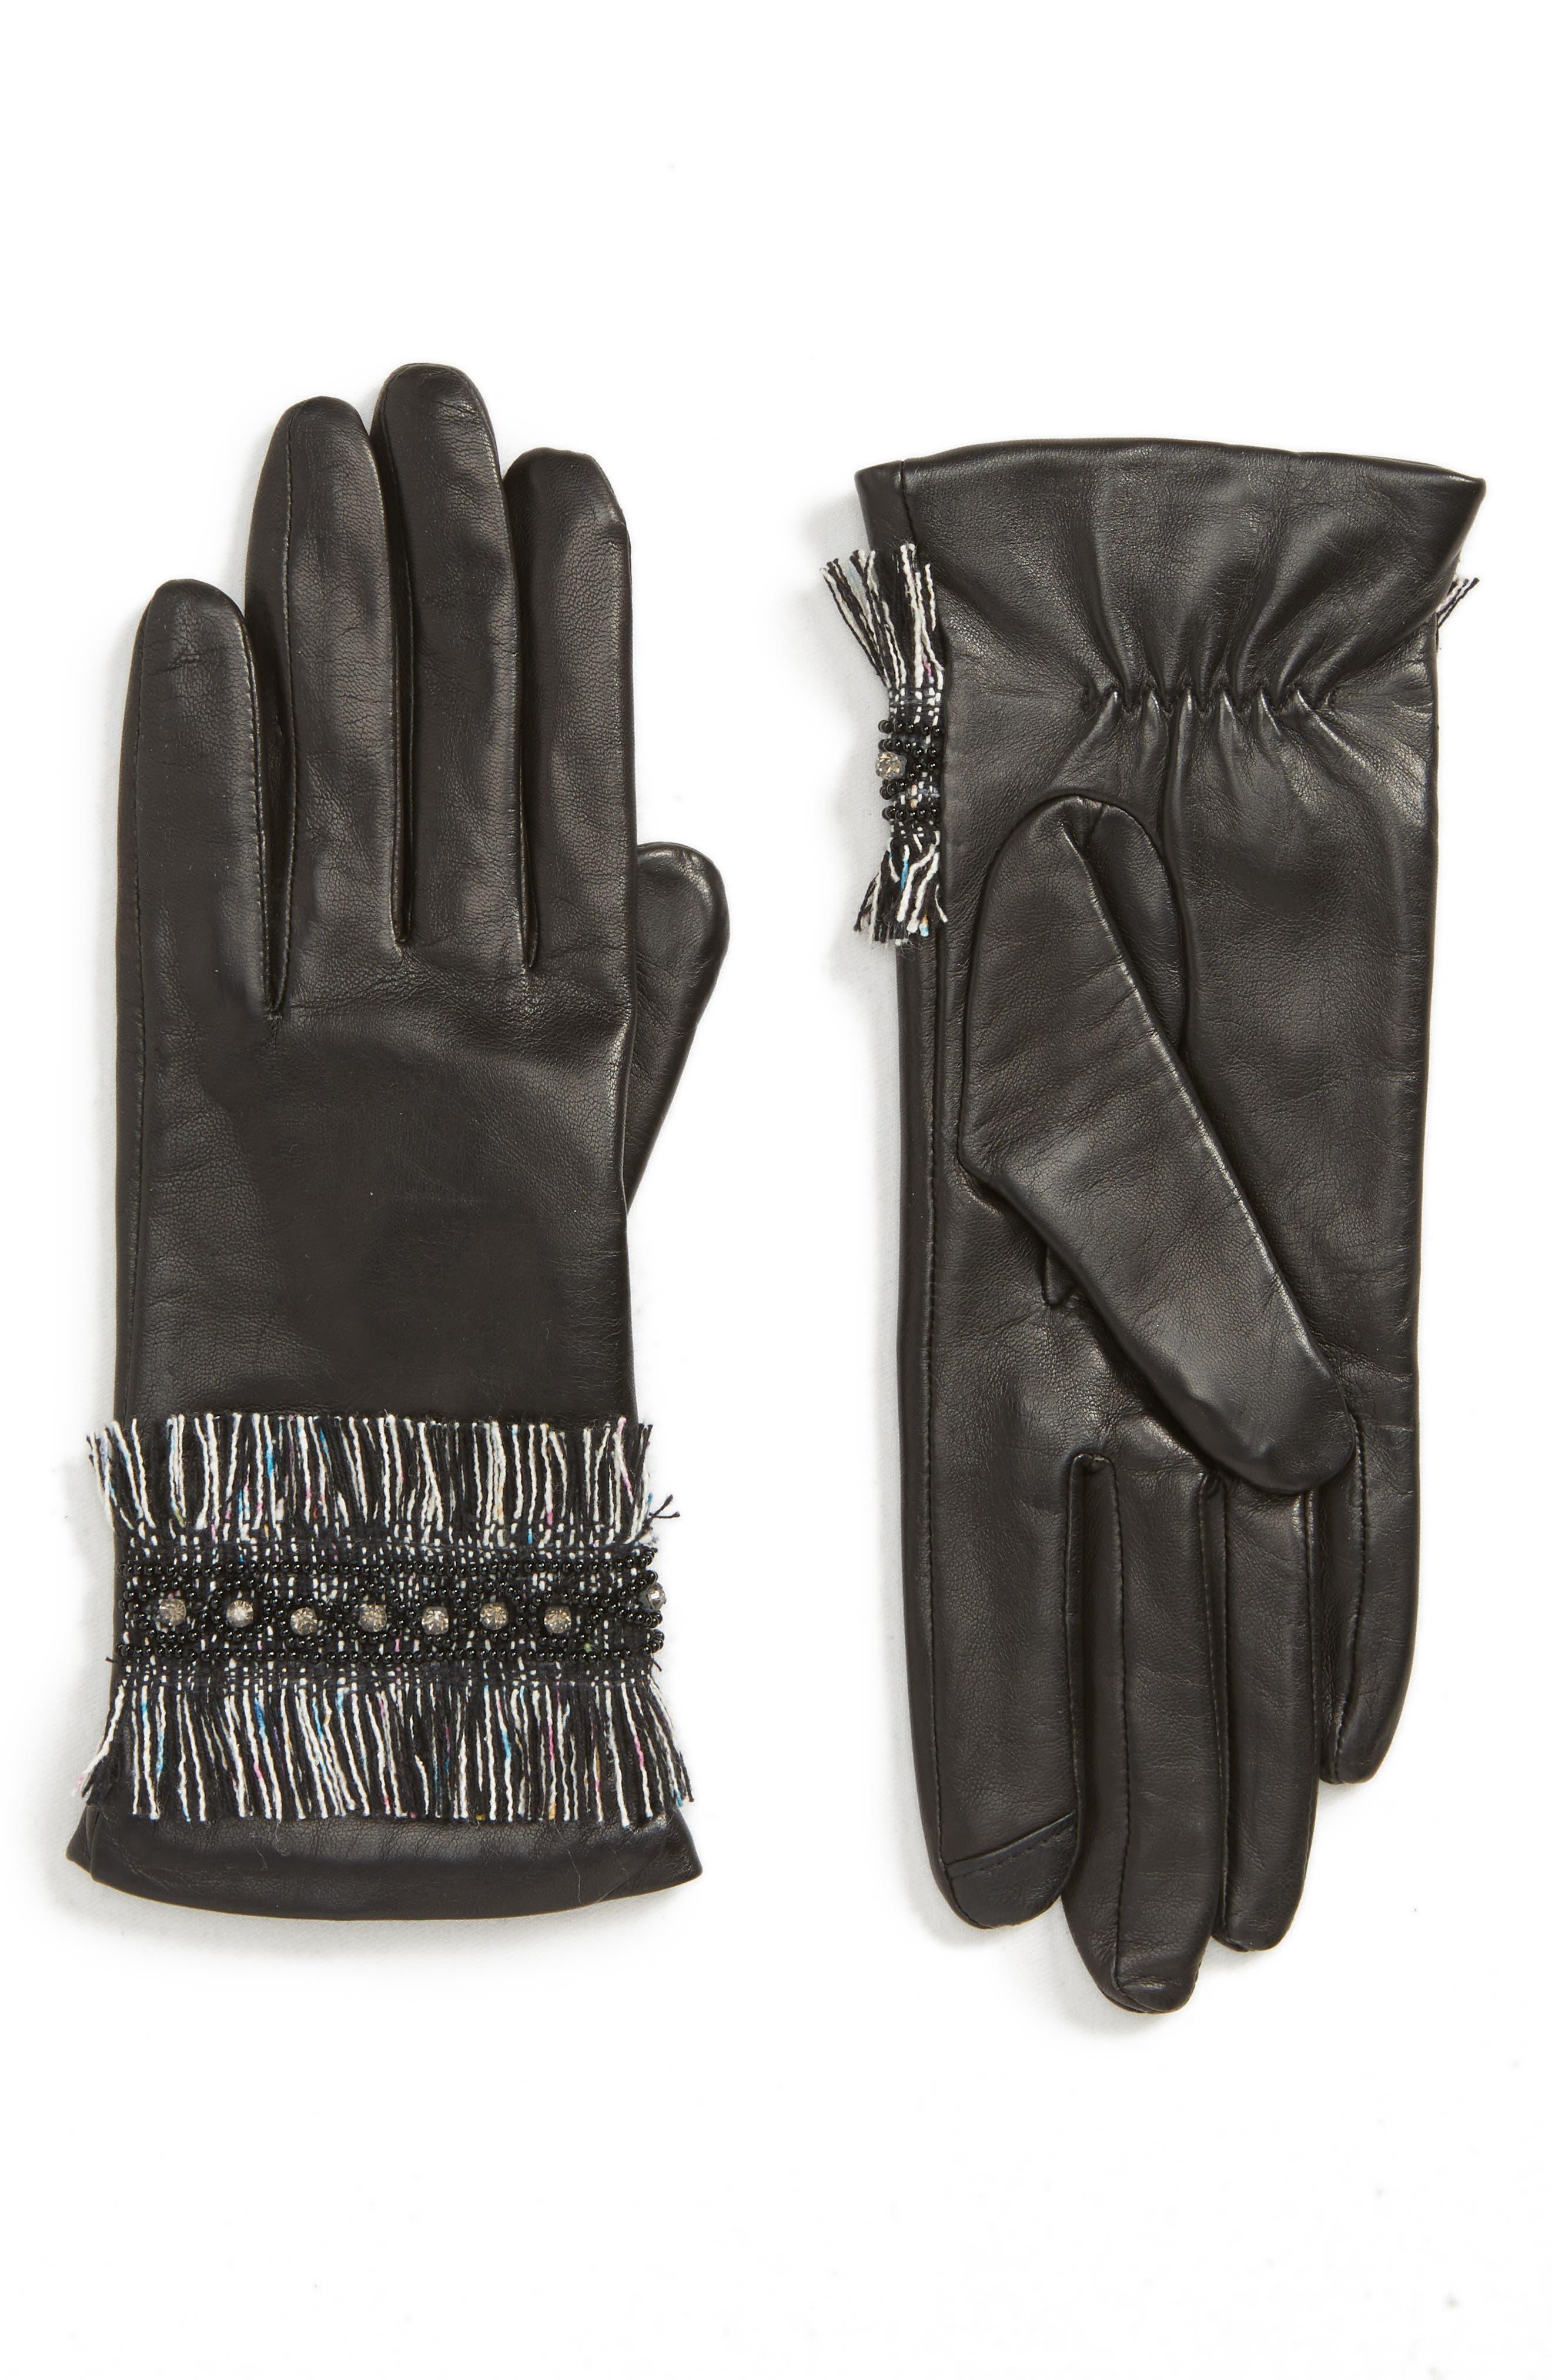 Badgley Mischka Fringe Cuff Leather Touchscreen Gloves, Black